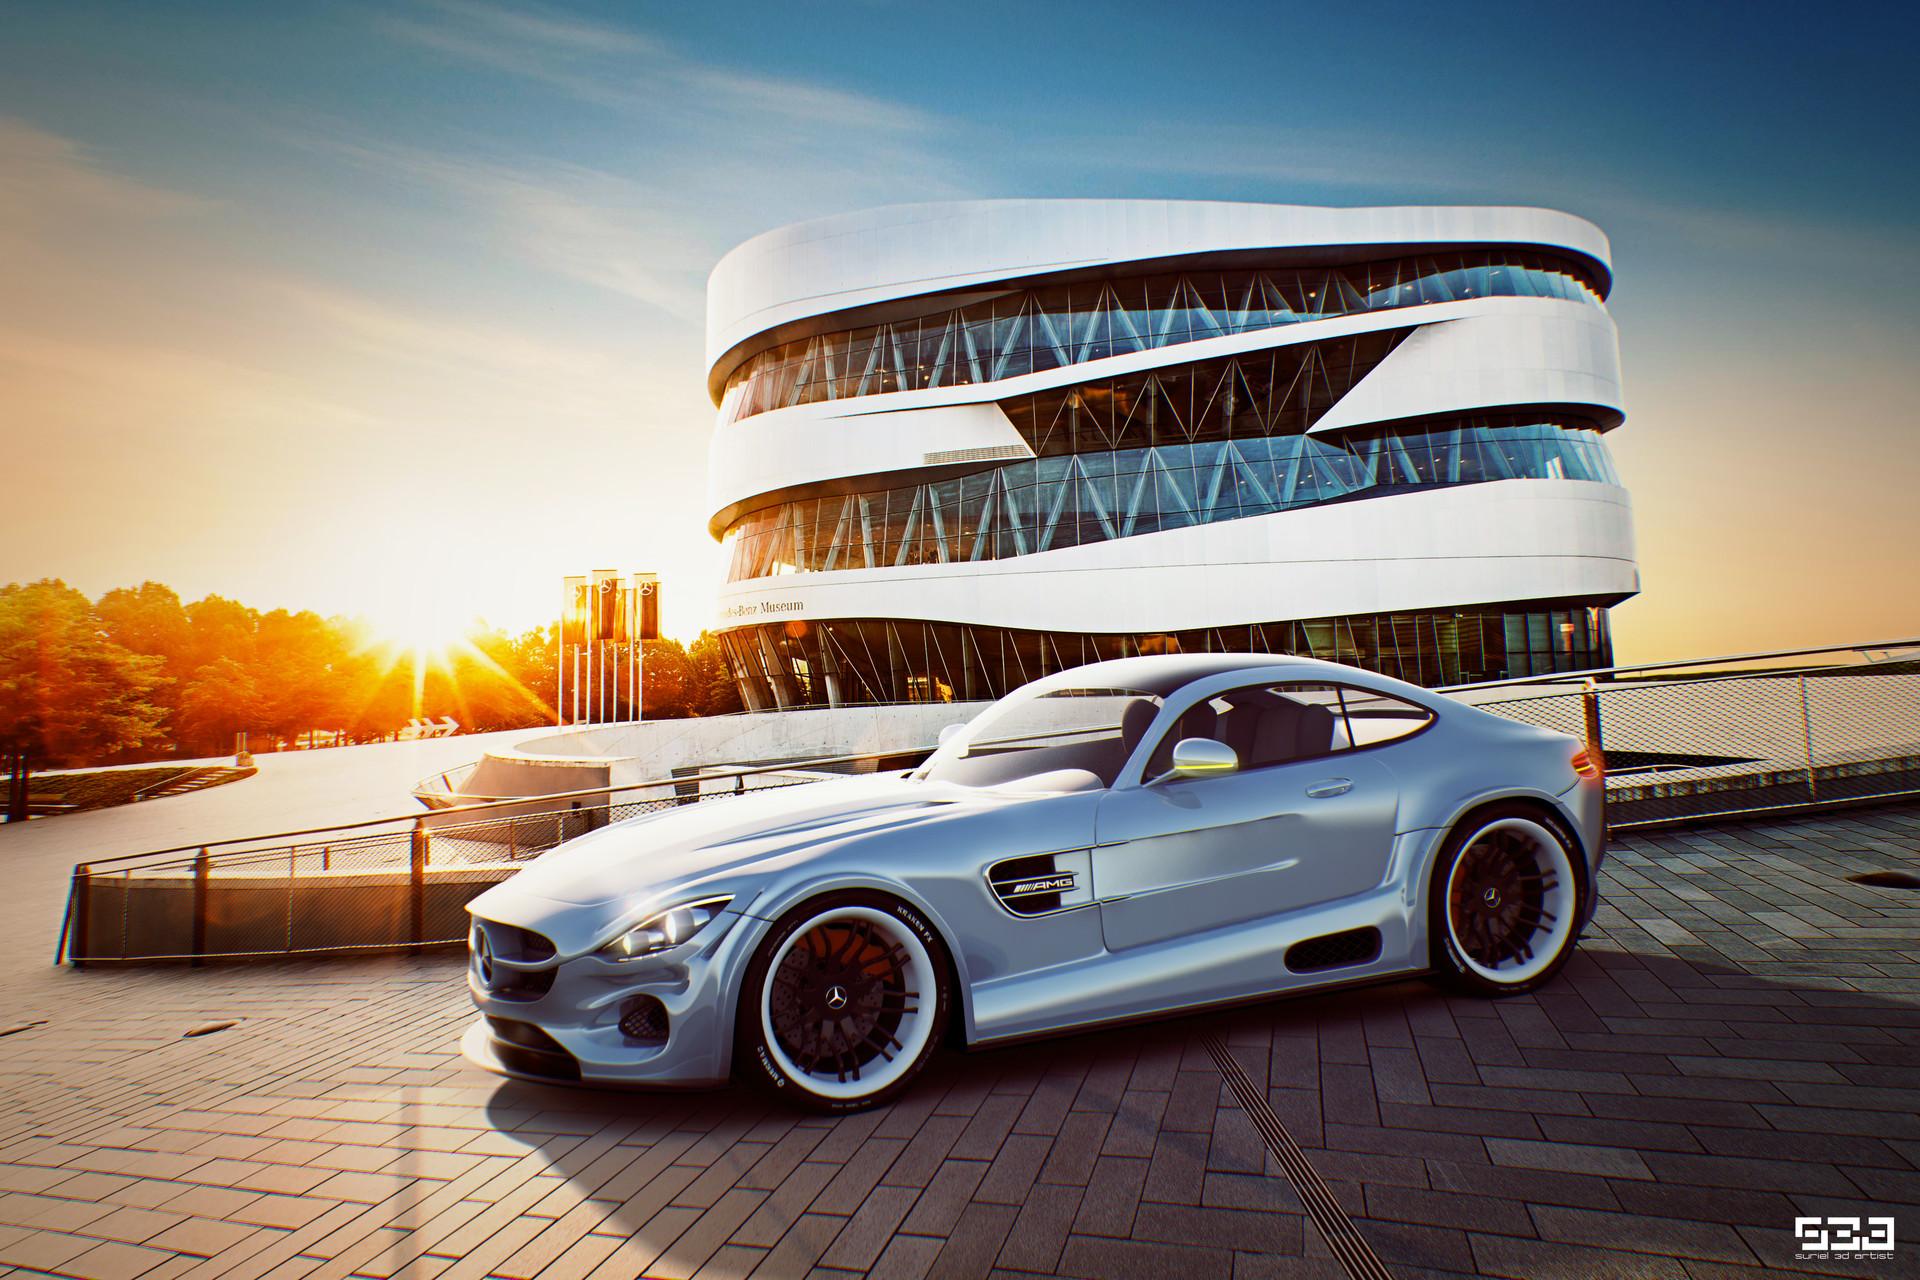 Mercedes Benz Amg Gt Concept